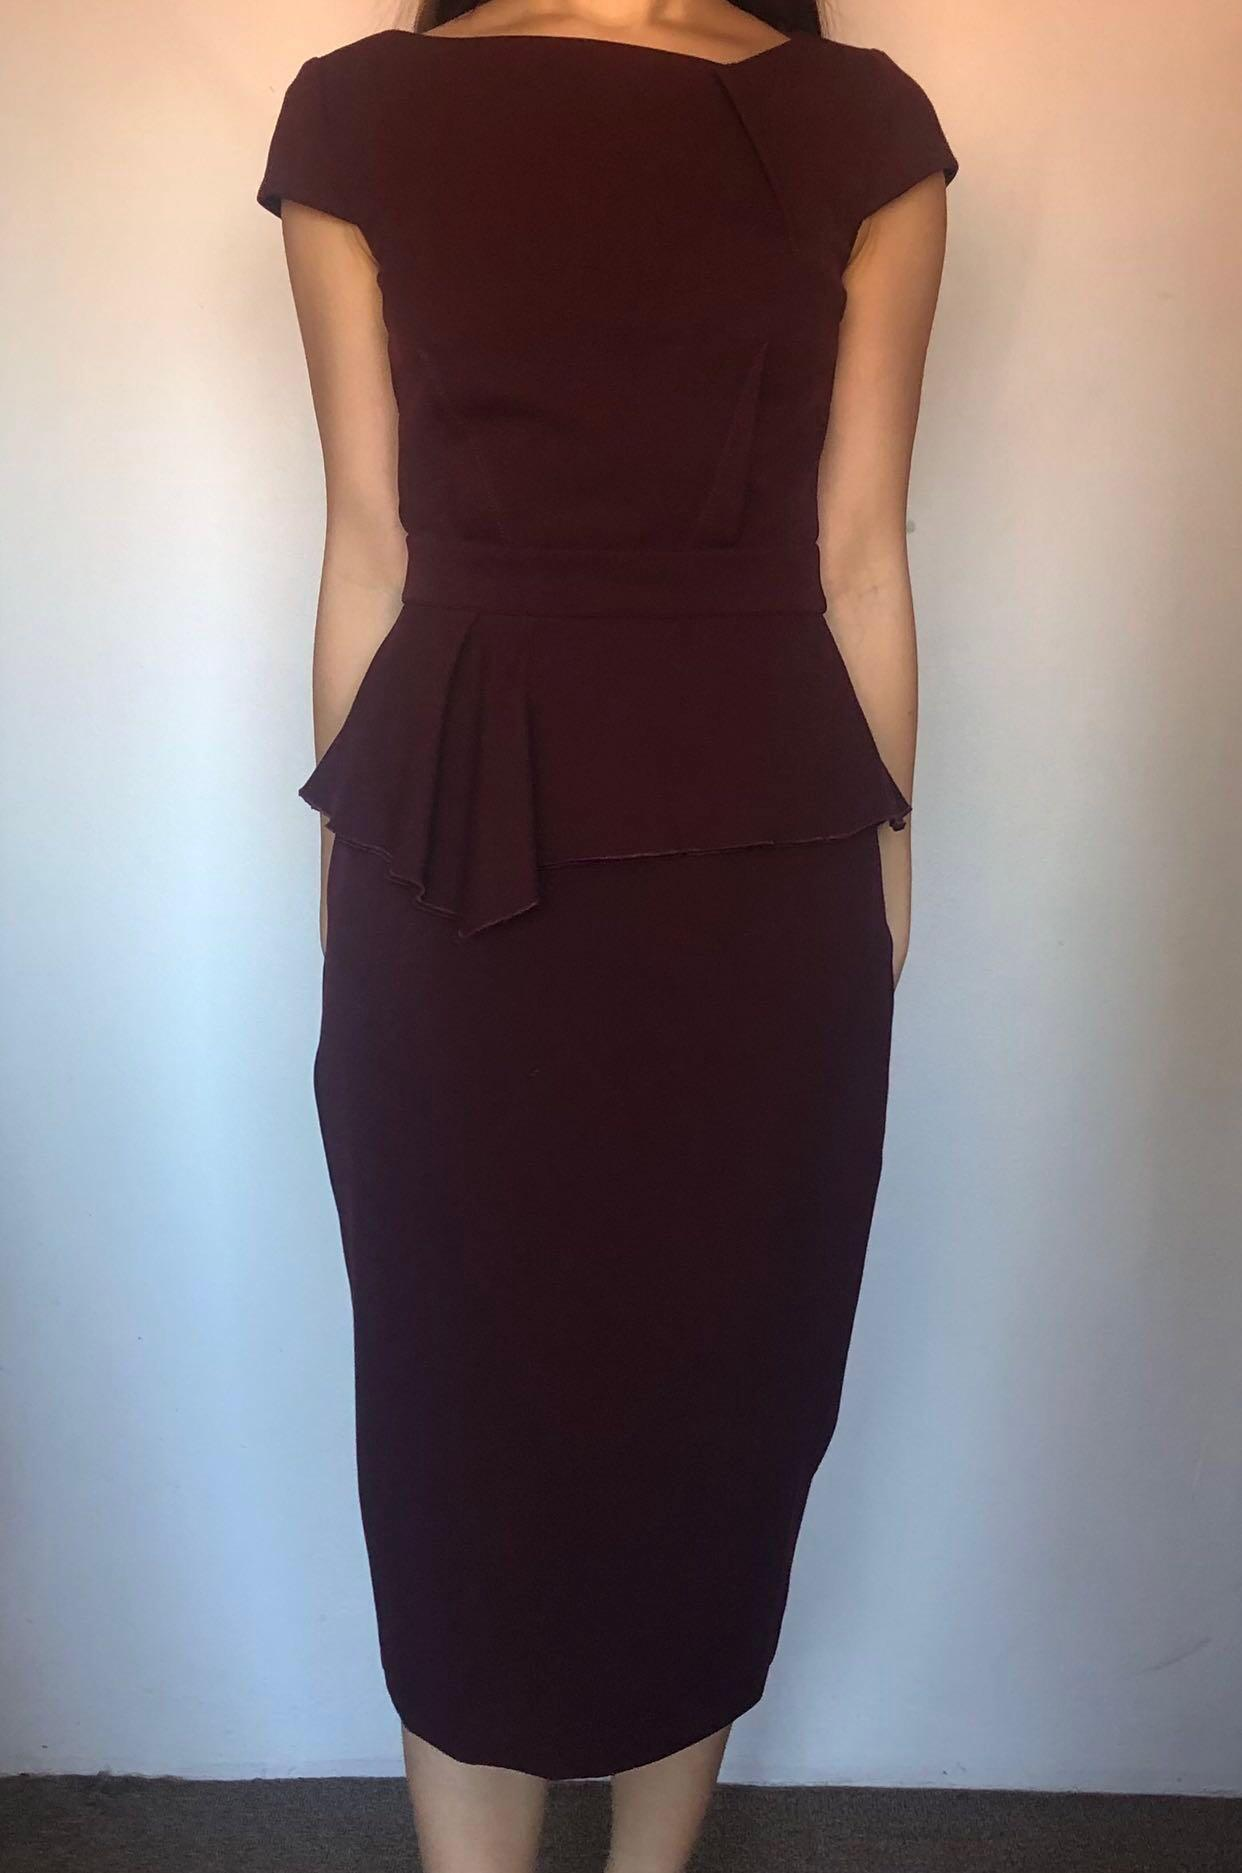 CUE | Draped Peplum Pencil Dress in Plum | Size 6 | NEW!!